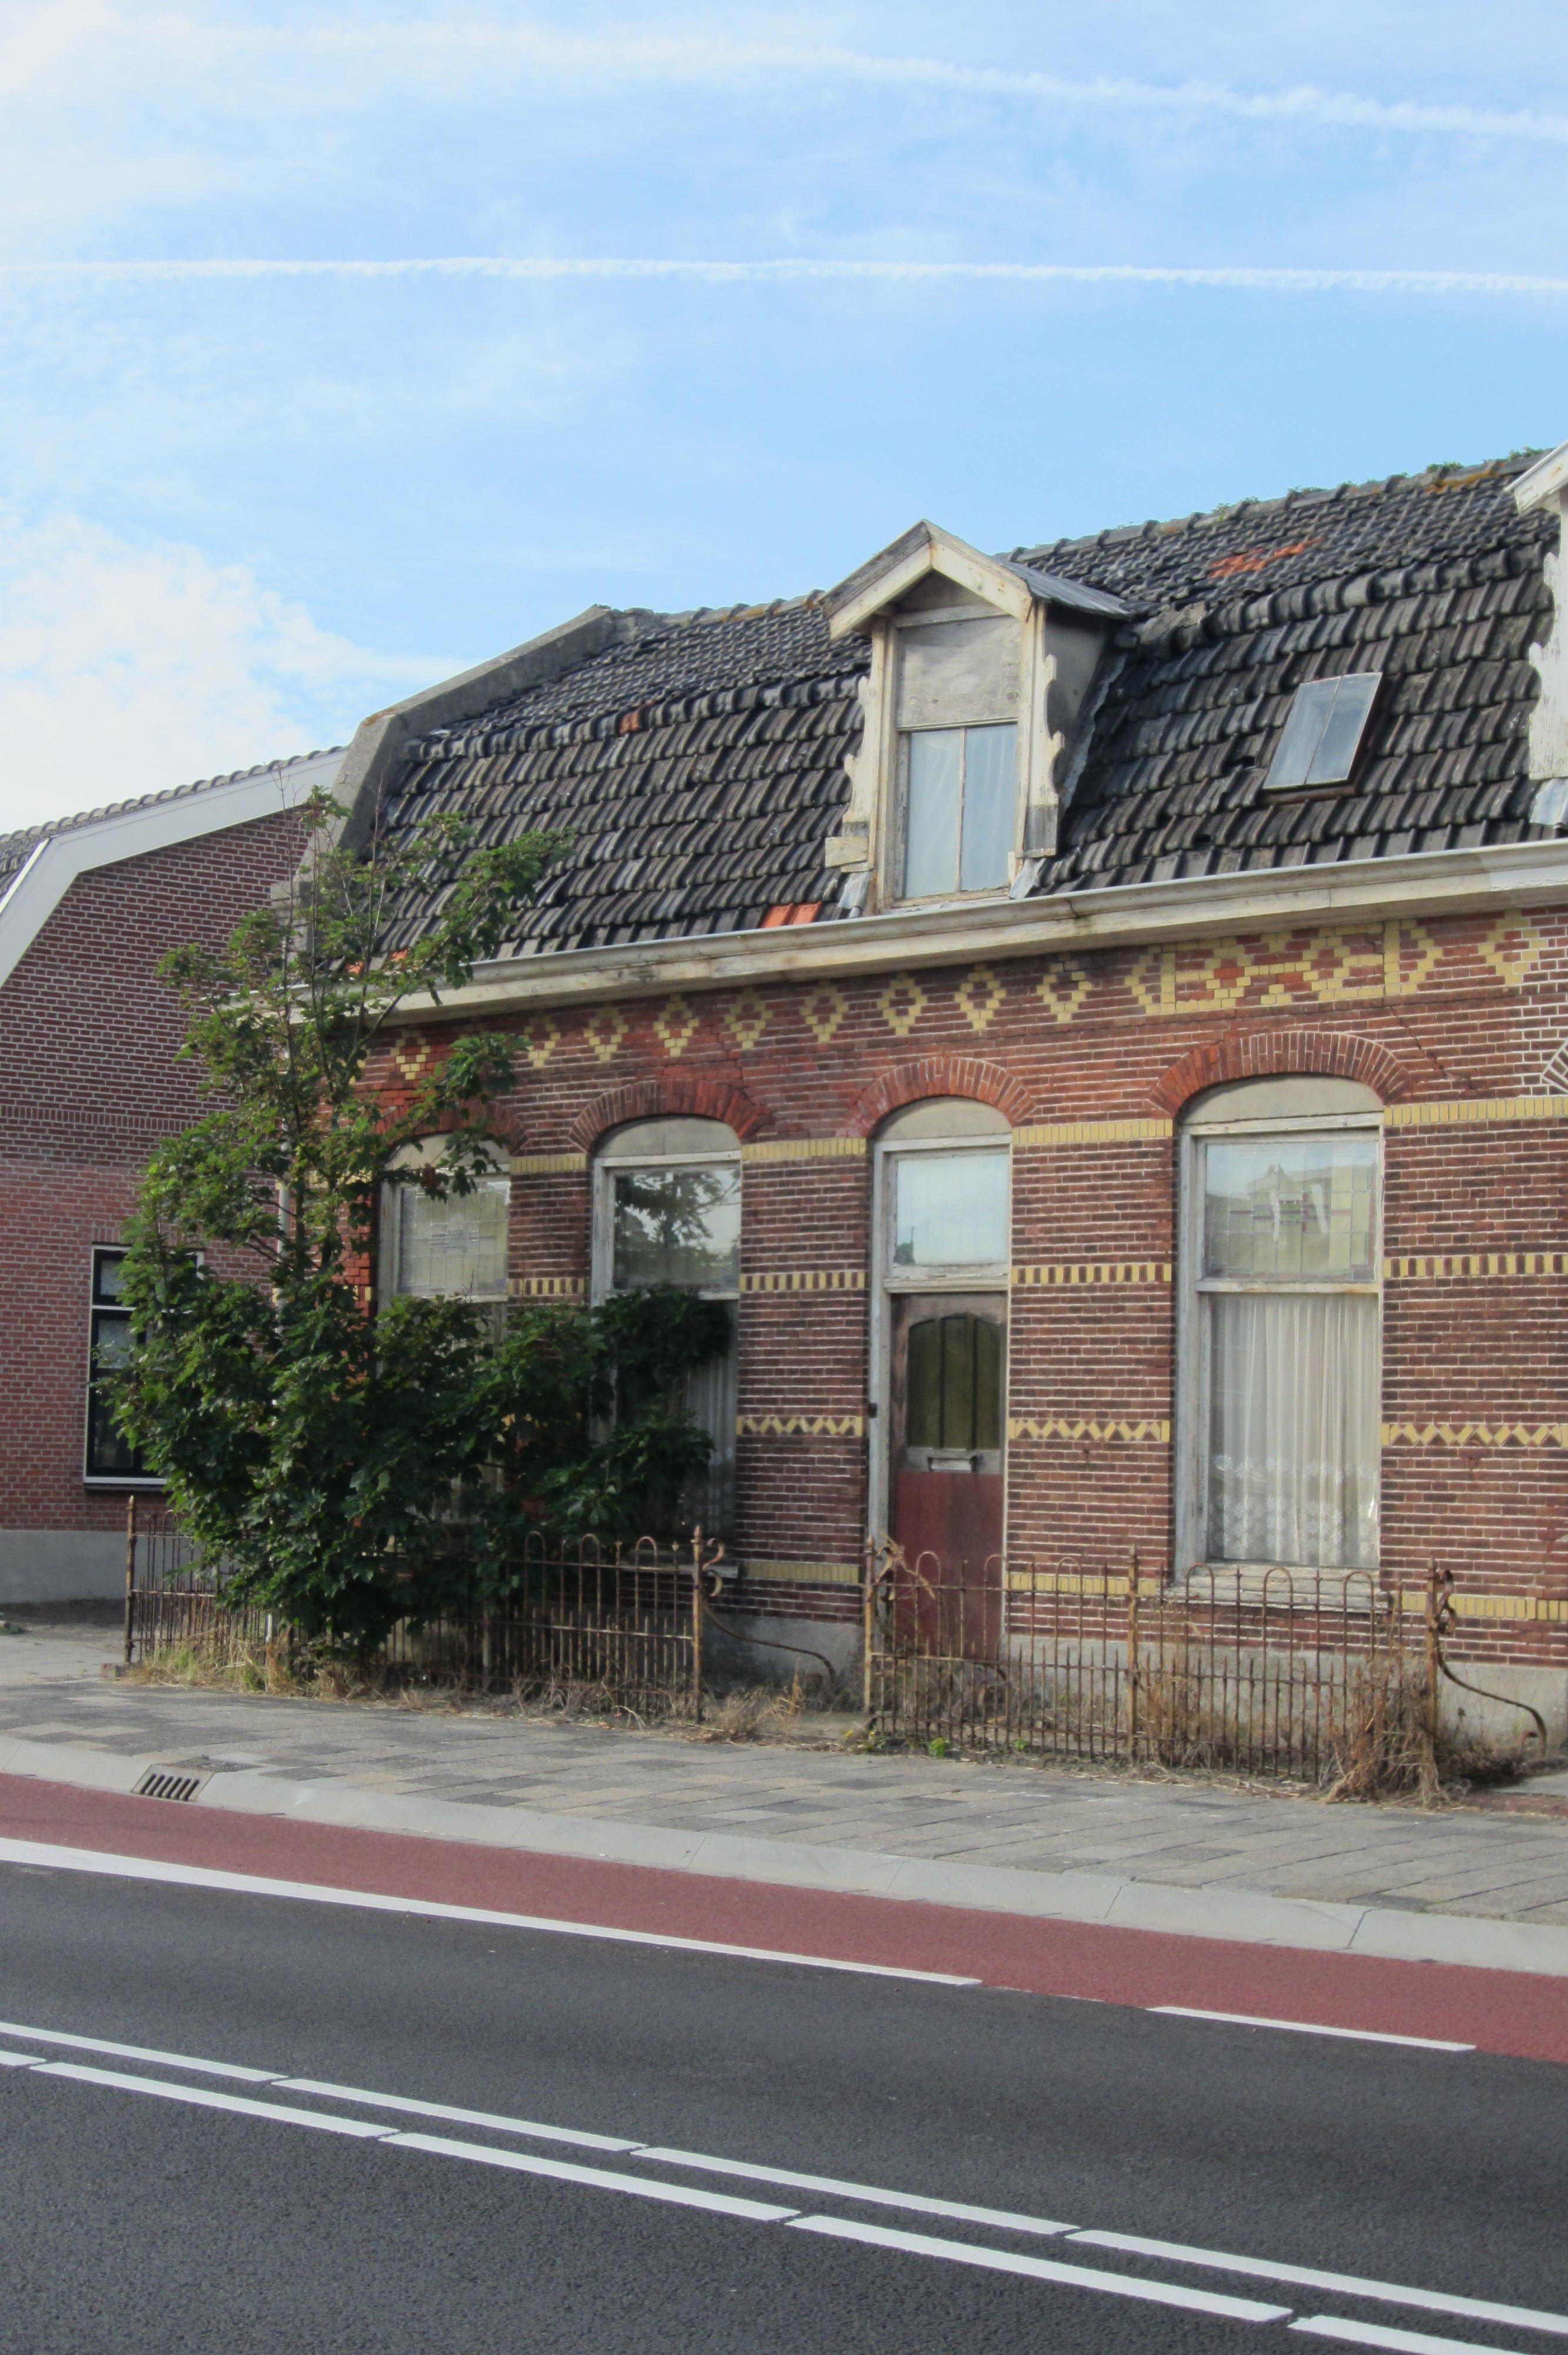 Noordwijk, abandoned but beautiful on mainstreet